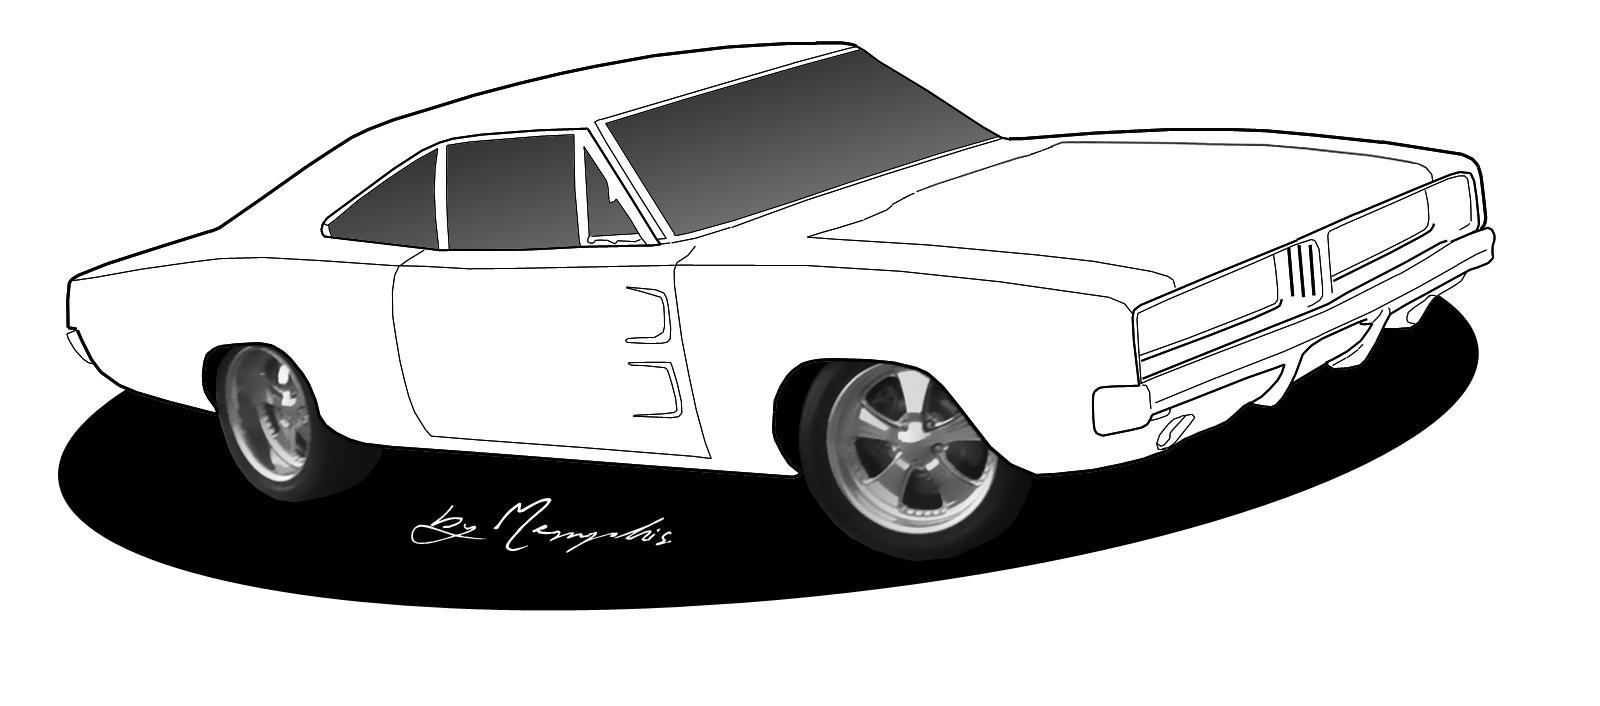 Classic clipart classic muscle car Car clipart car Muscle clipart